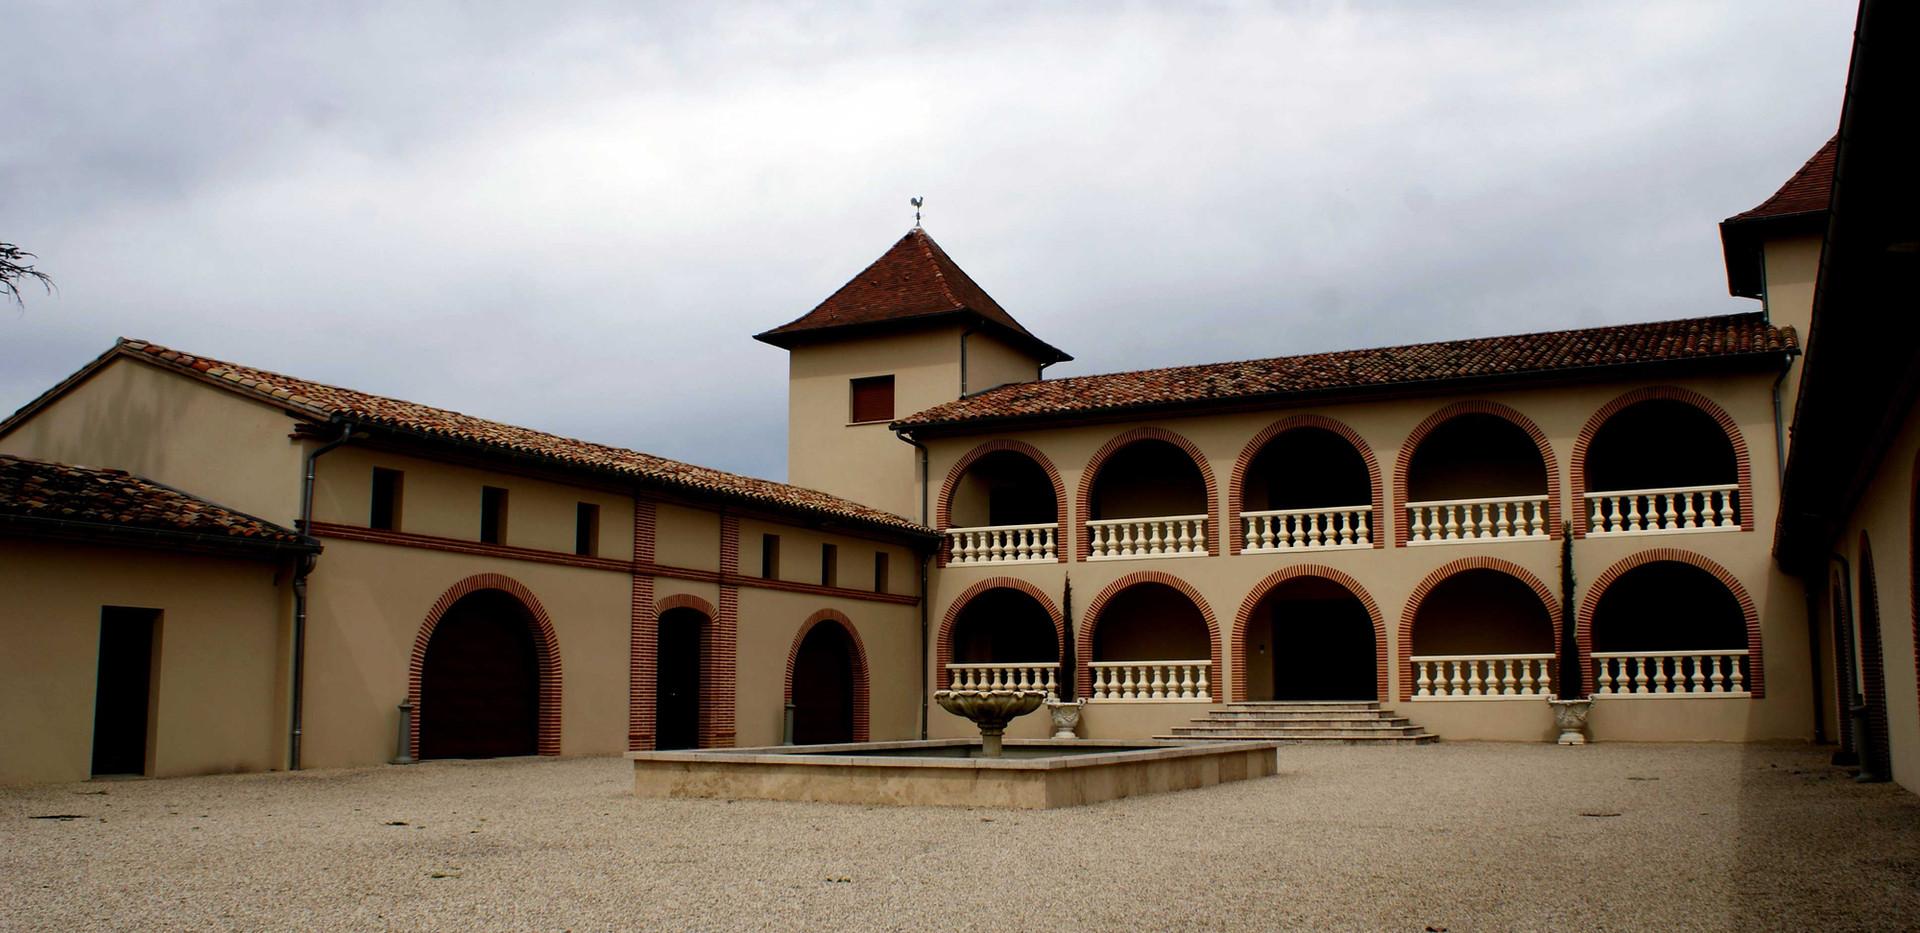 Chateau_Cassin_9.jpg